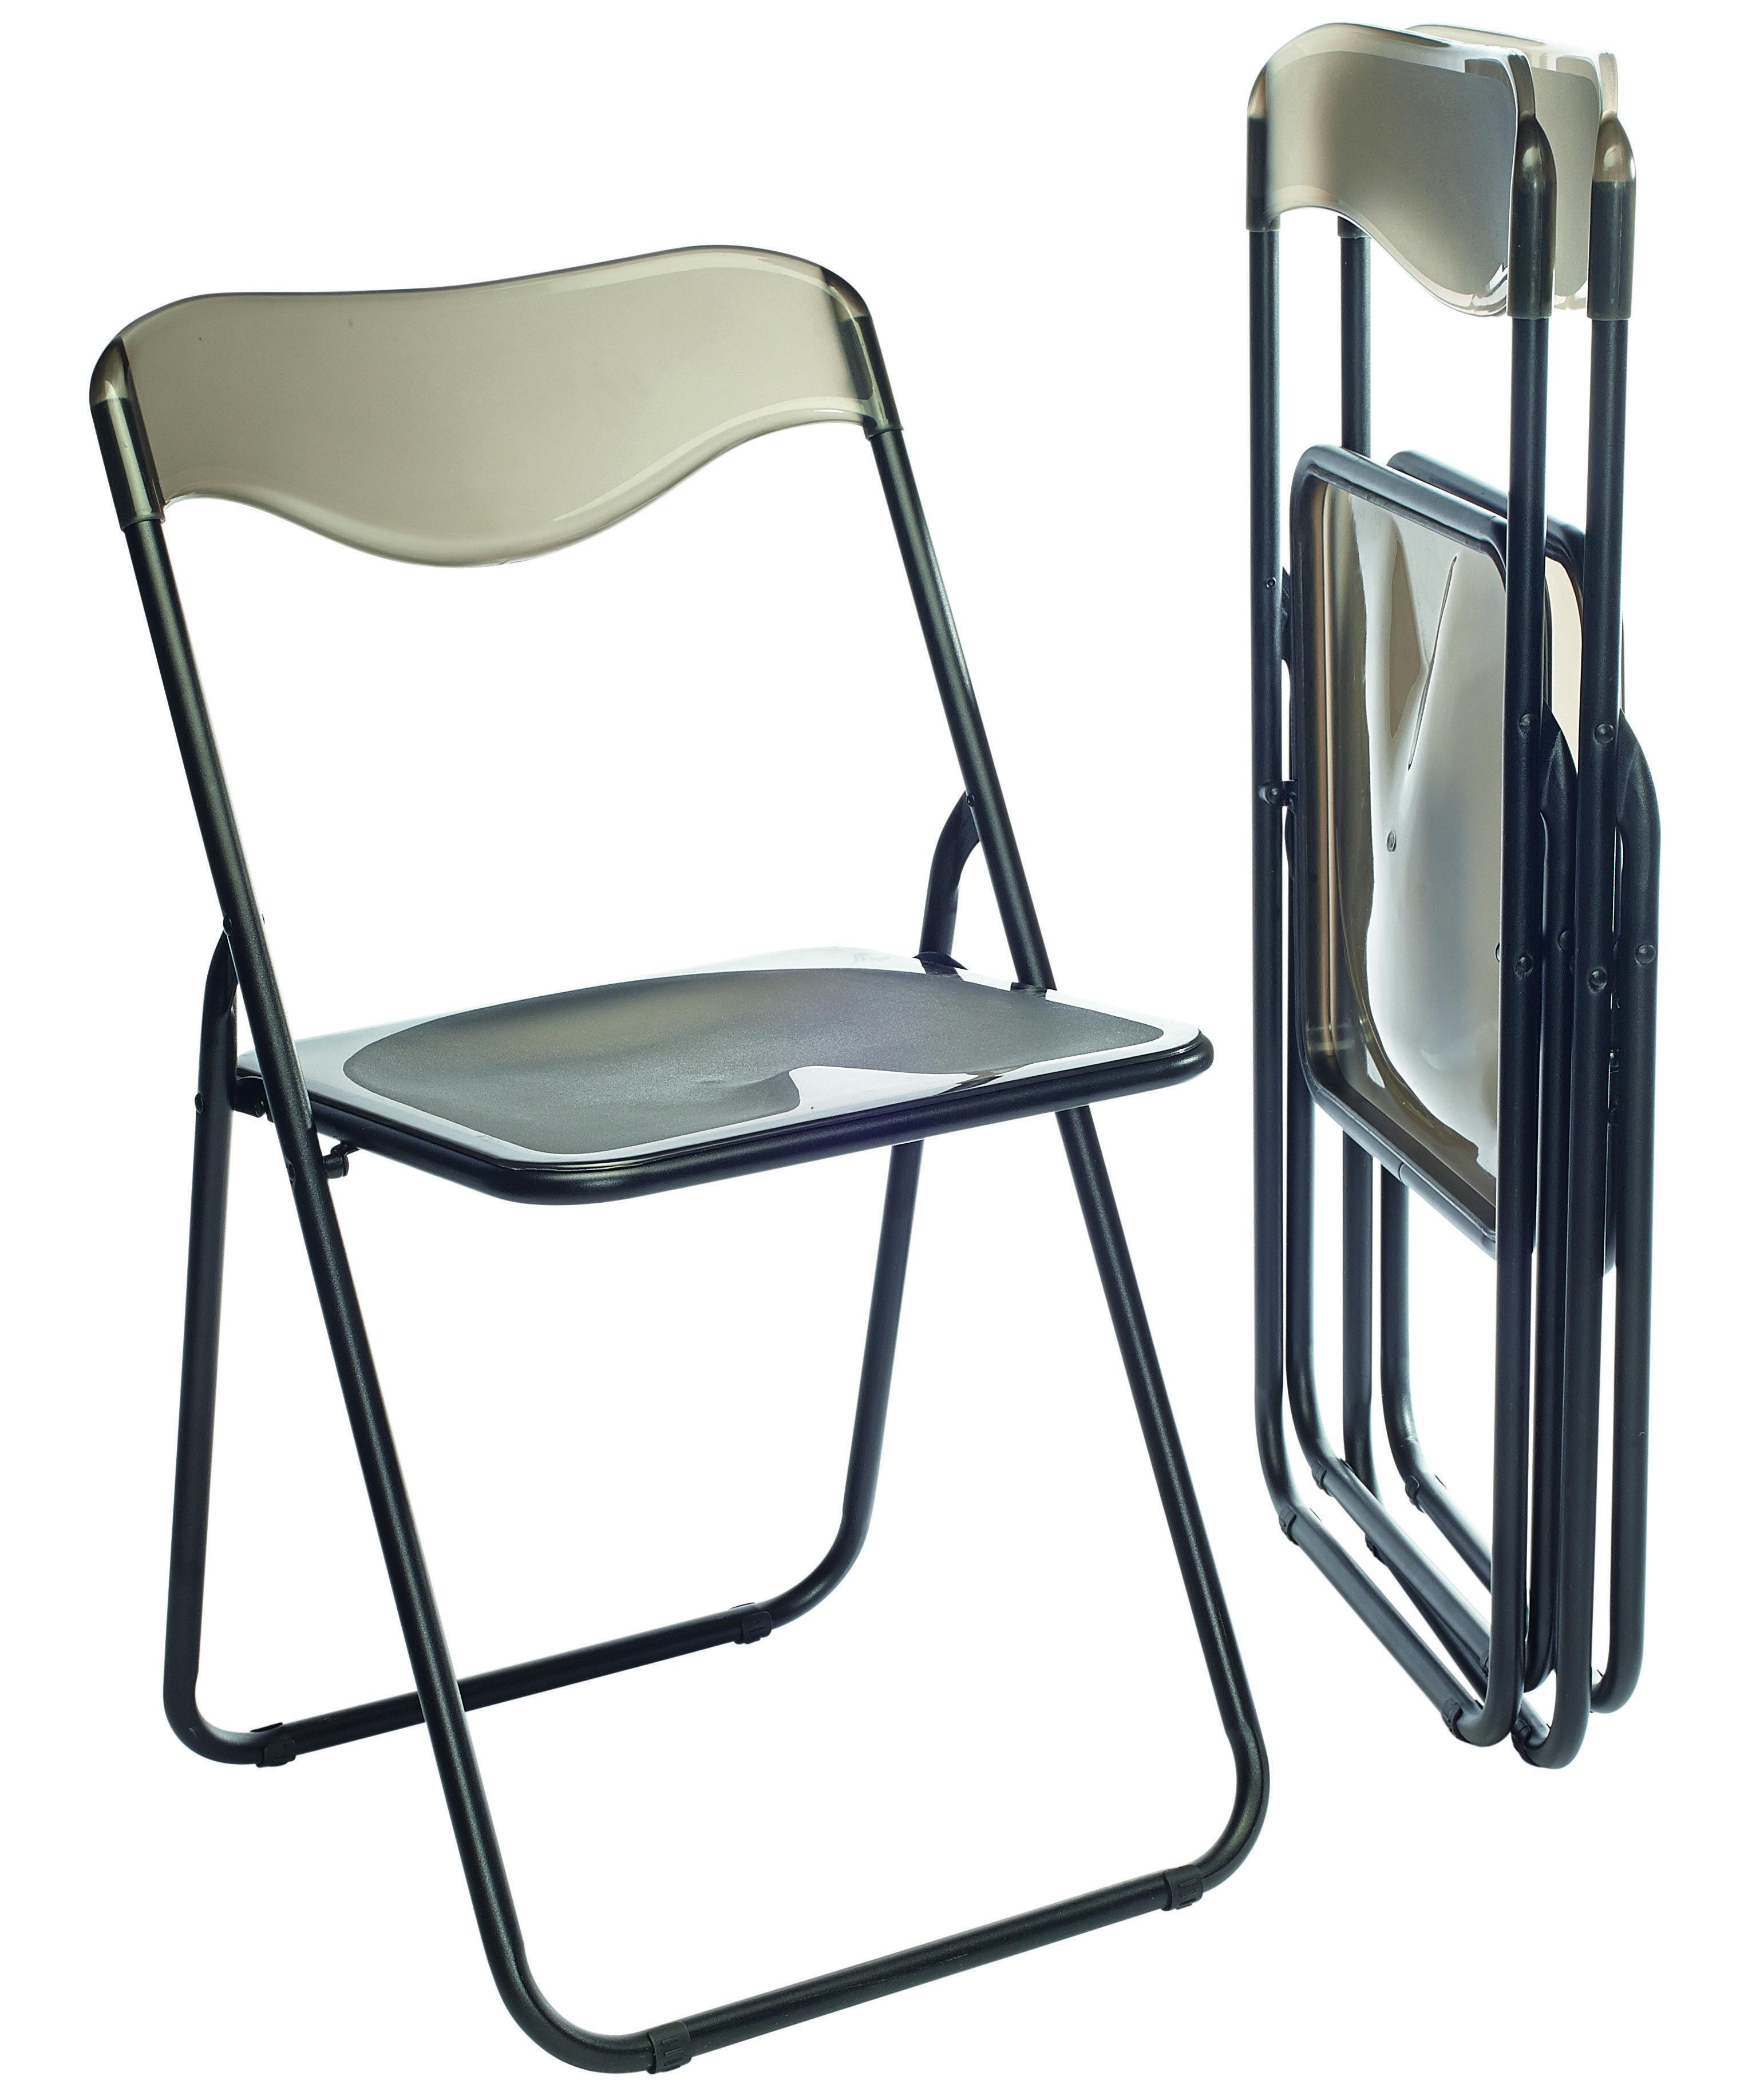 aki home convenient folding chairs find them at www http aki